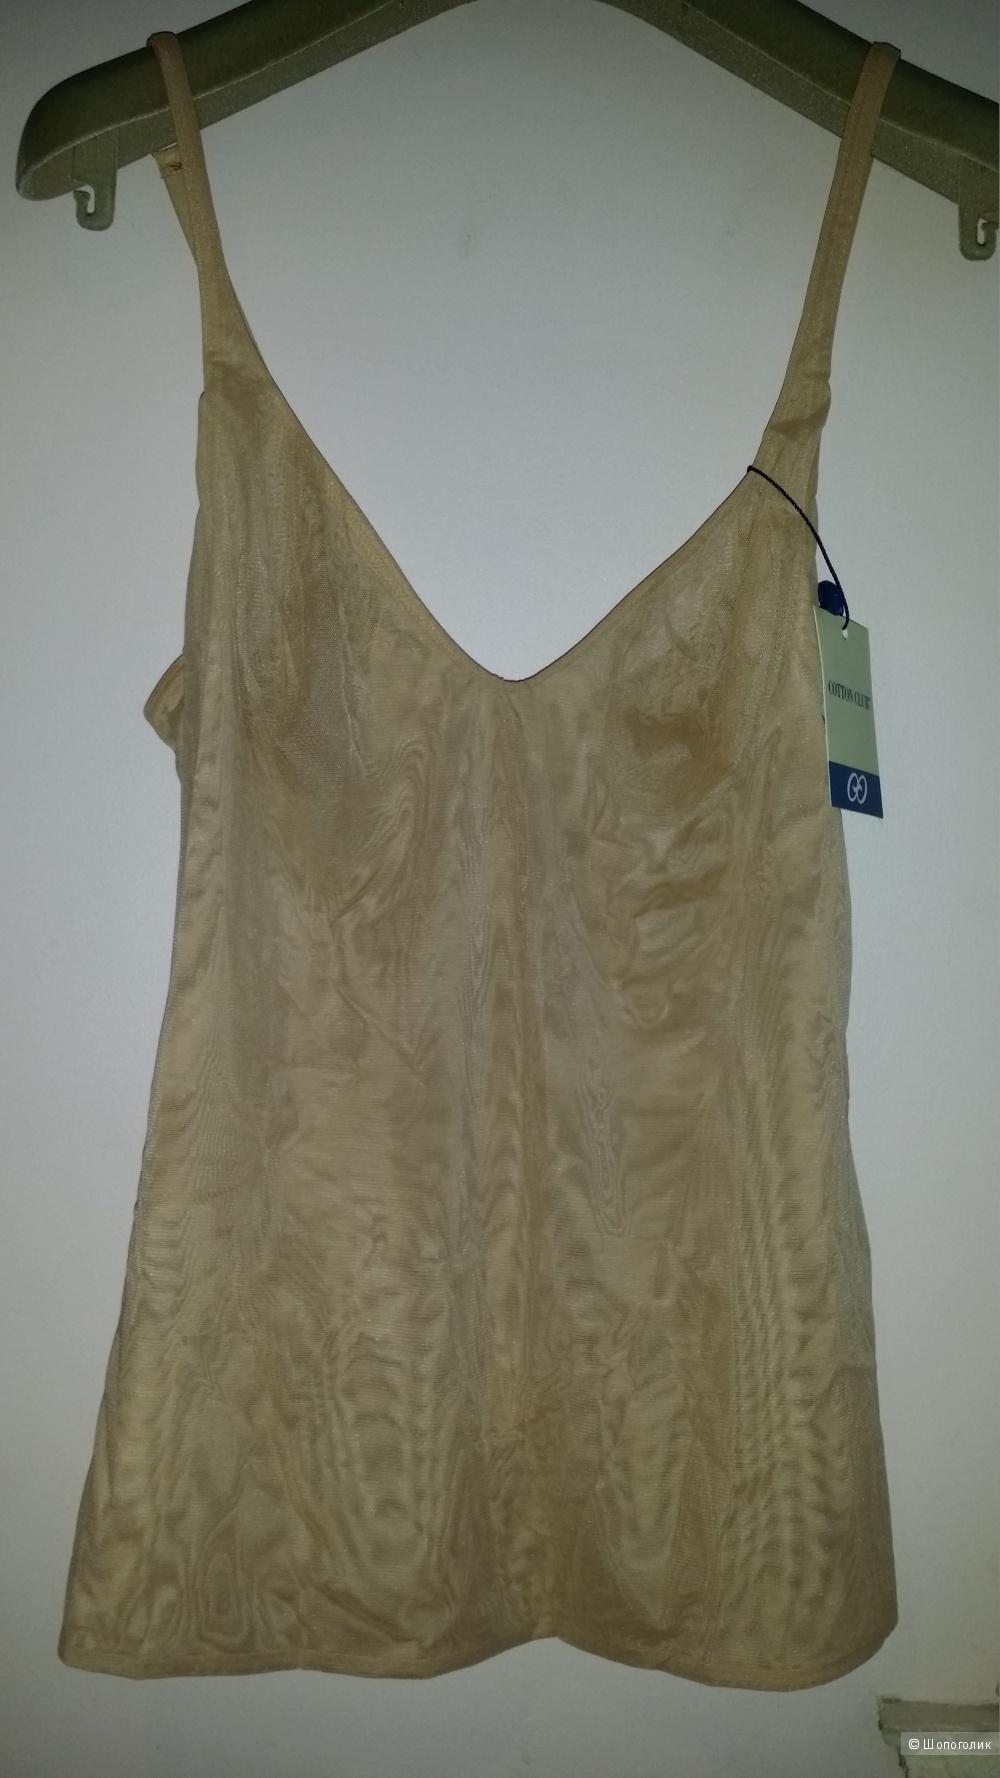 Топ нижний Cotton Club, I    4  , D 85  , USA 38   XL